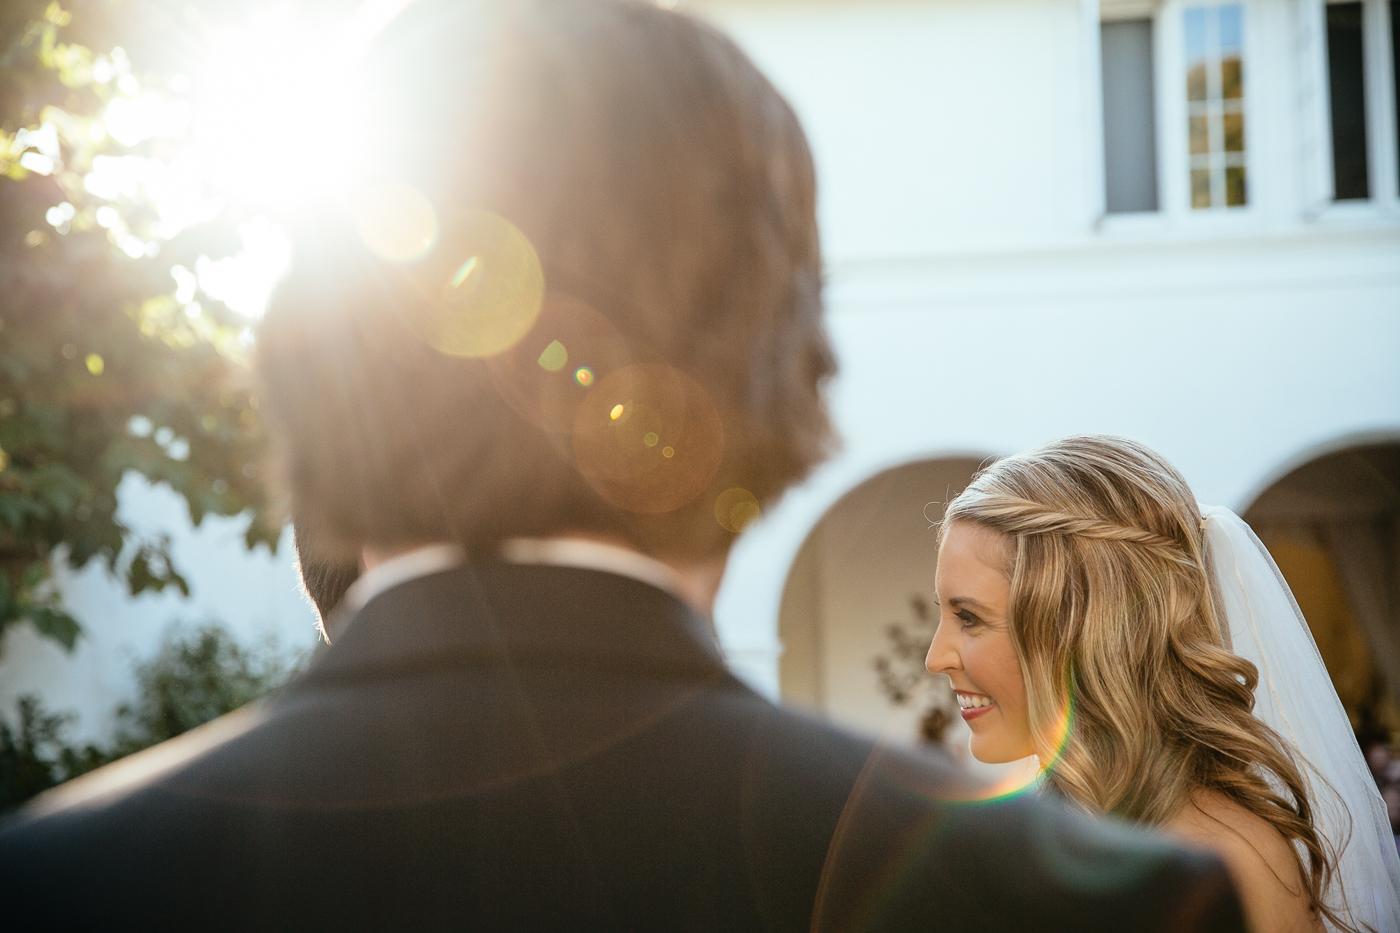 RYAN_&_KELLEY_DARLINGTON_HOUSE_WEDDING_2014_7X9A2114.JPG